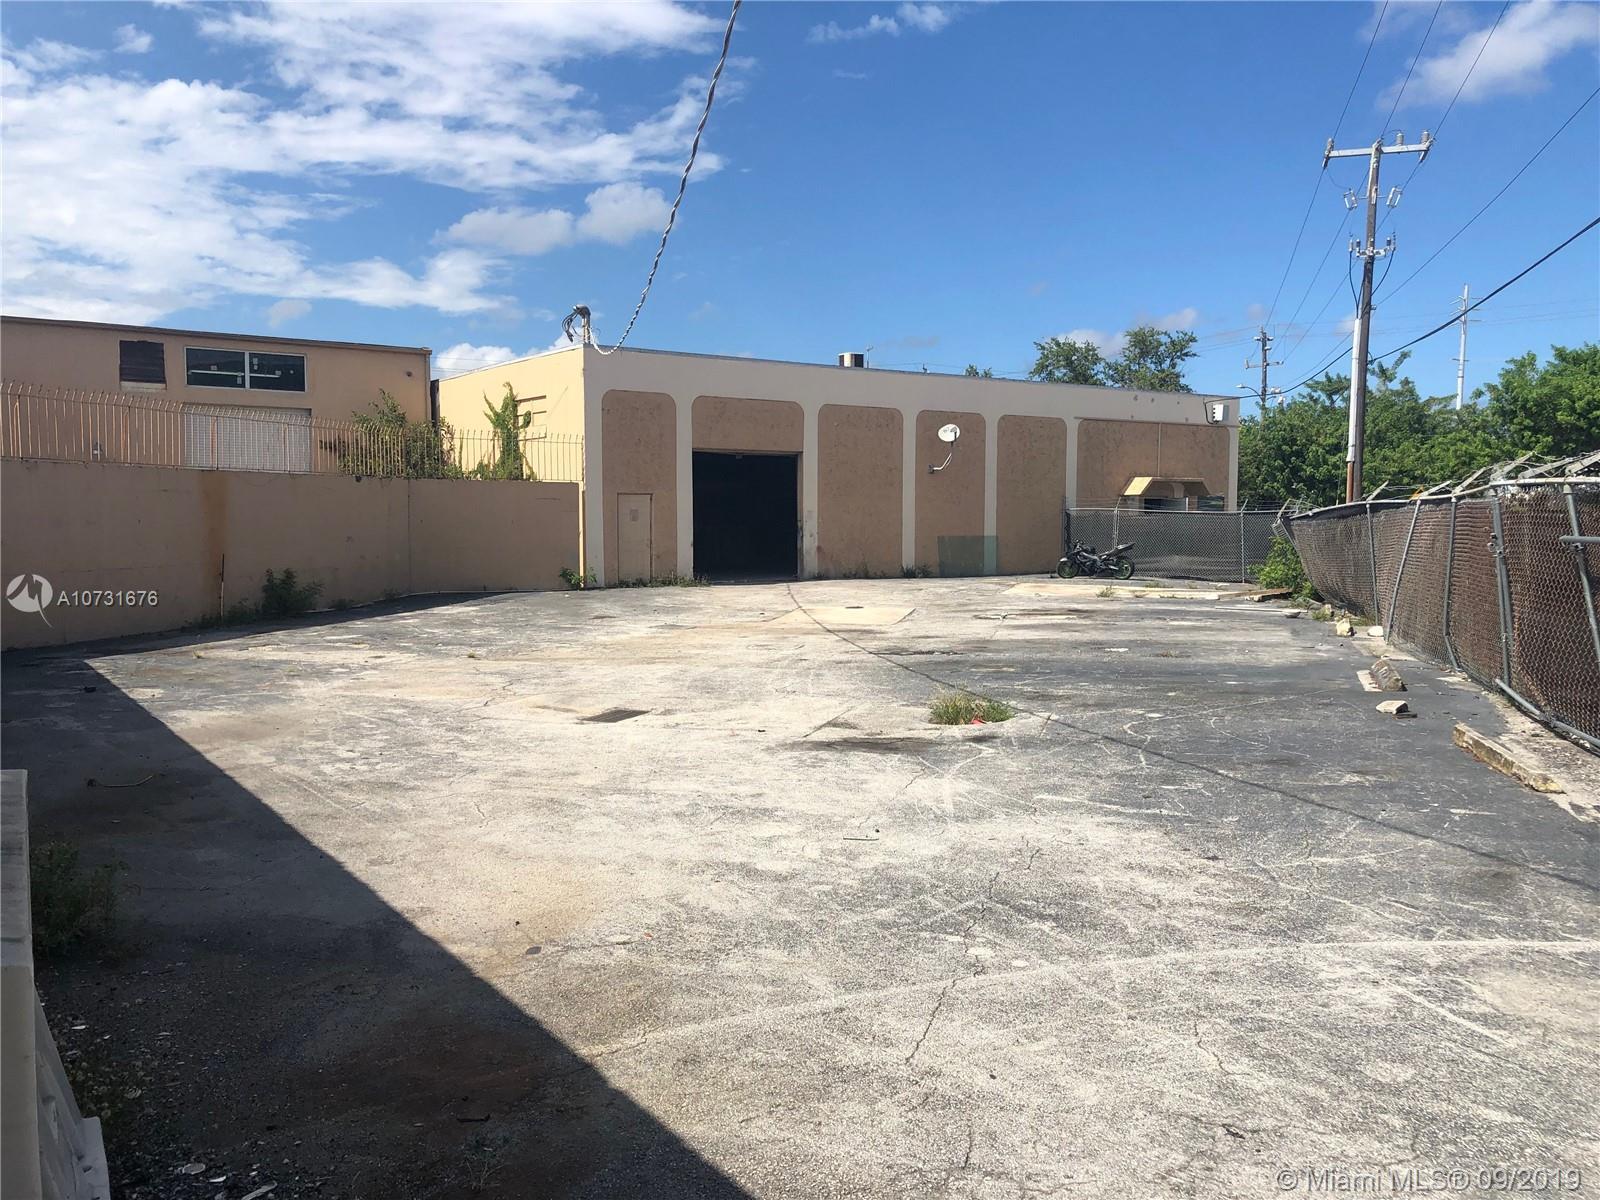 17050 NW 3rd Ave, North Miami Beach, FL 33169